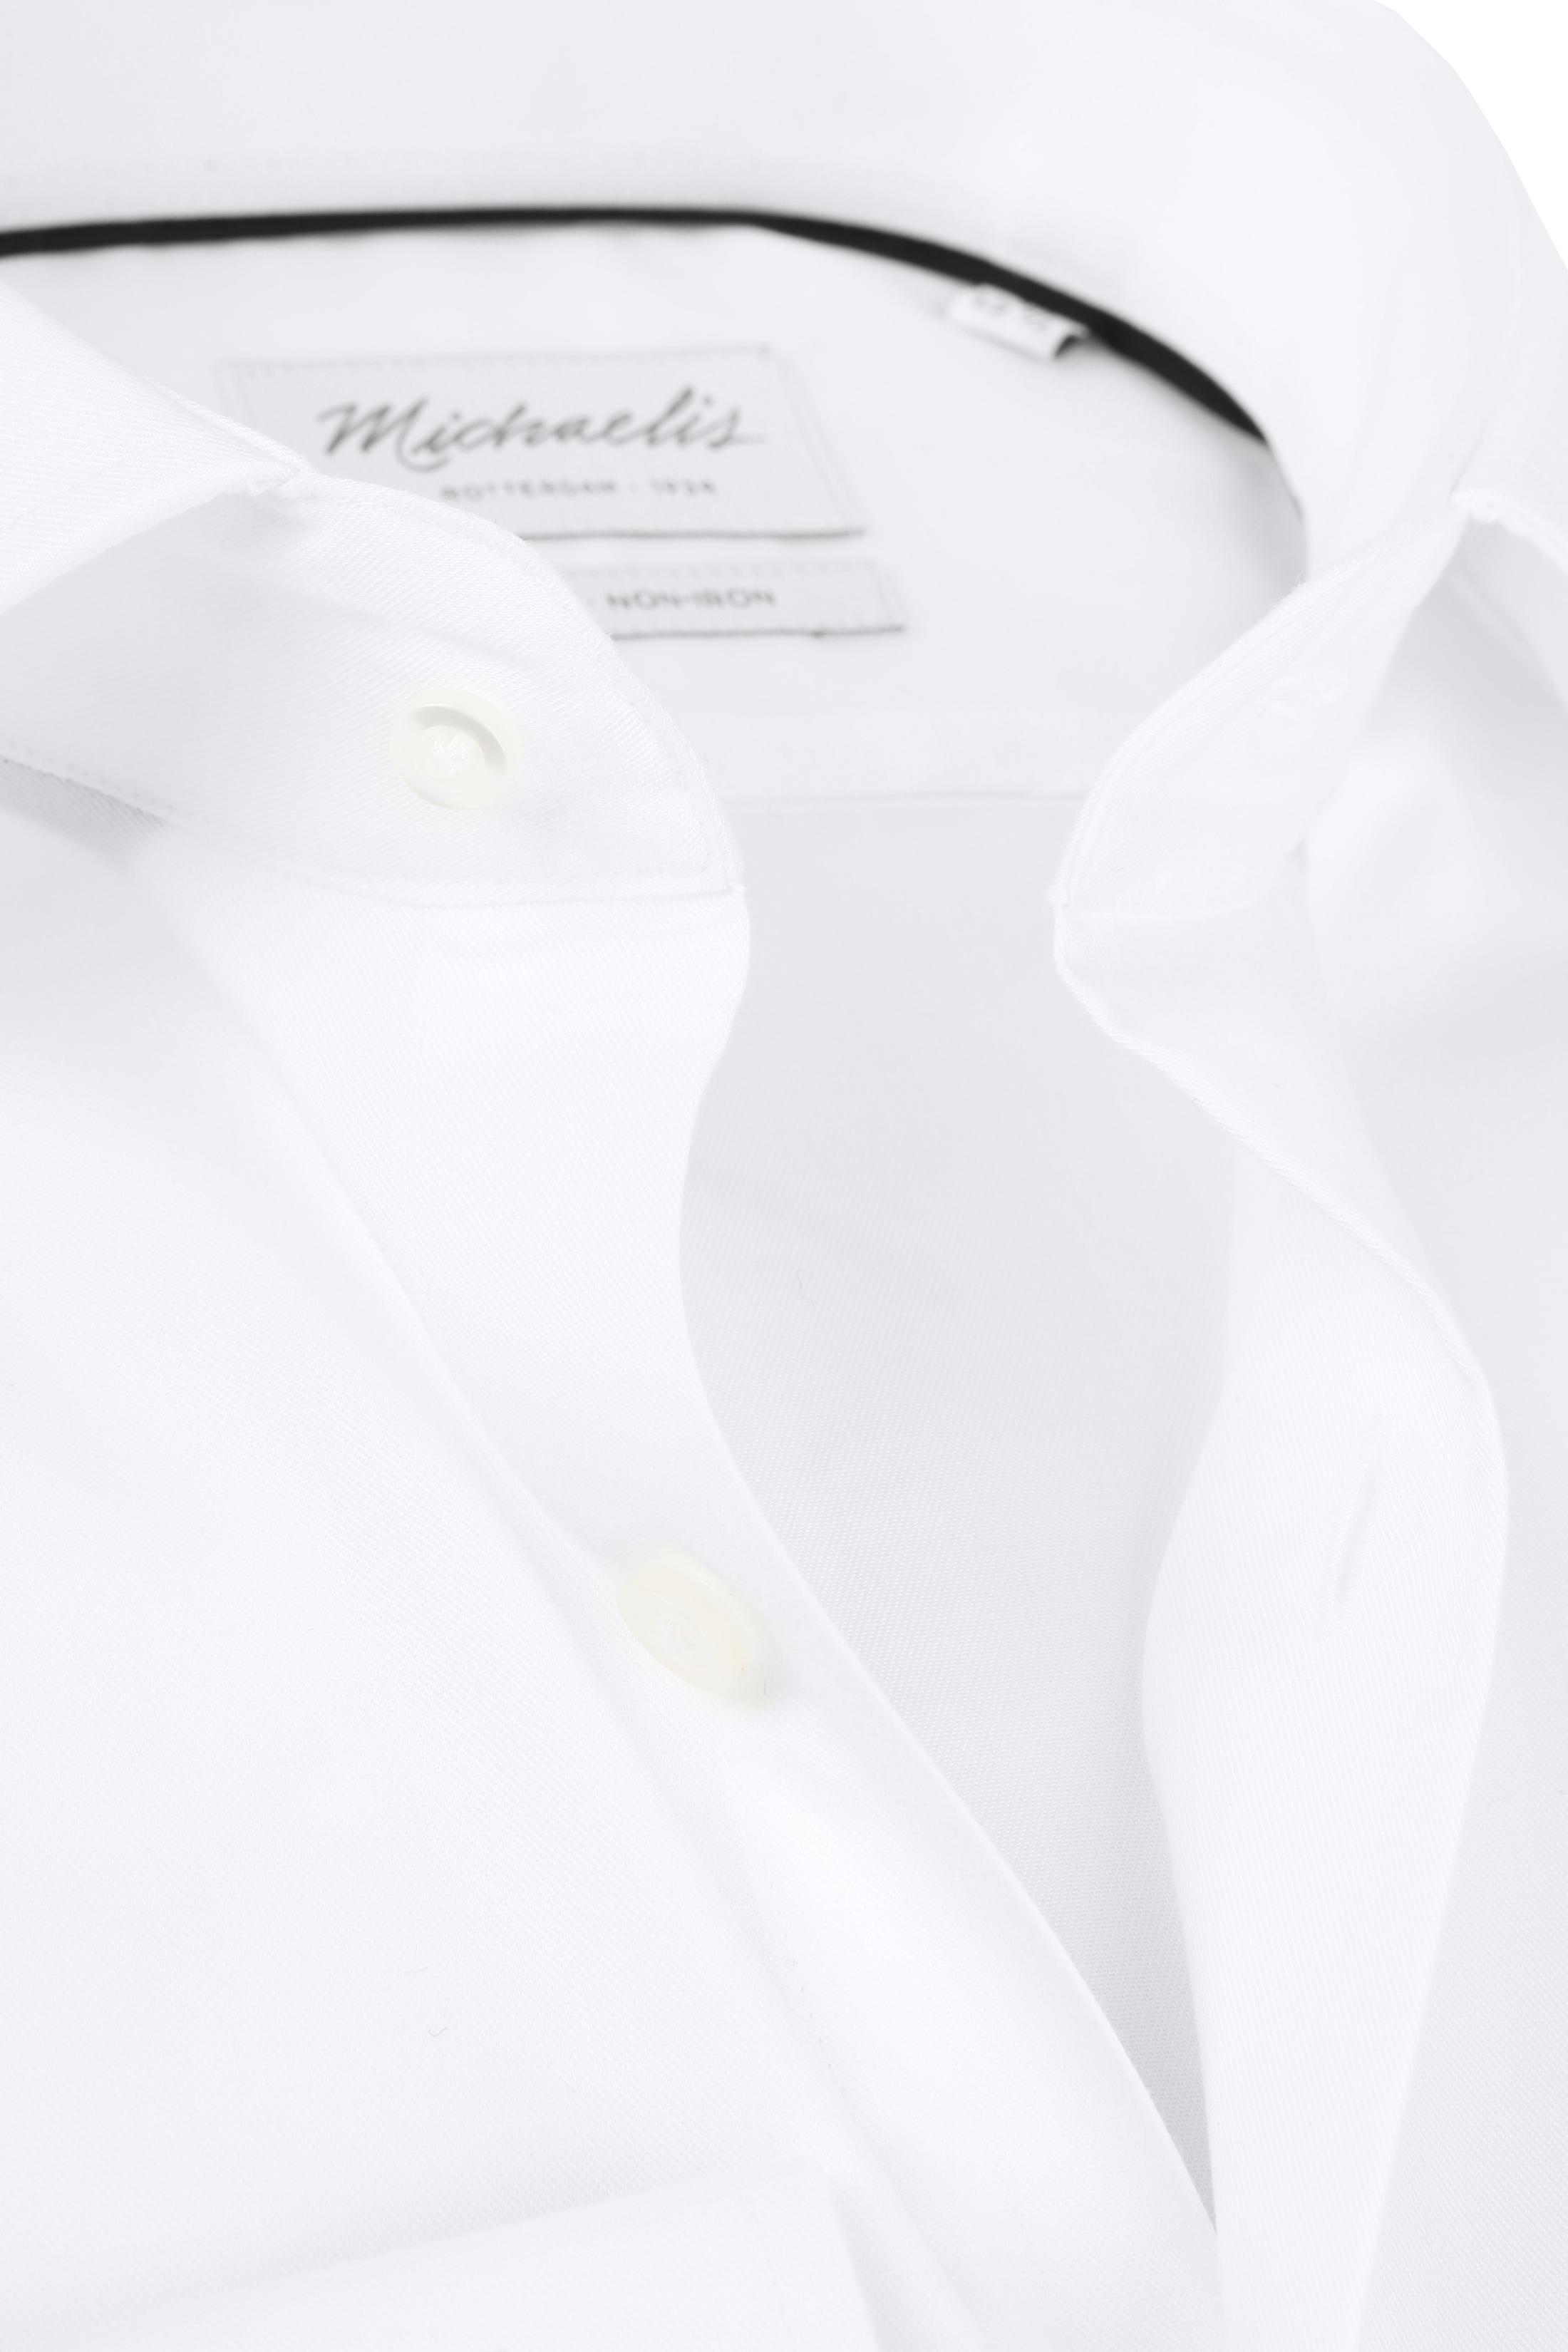 Michaelis Overhemd Slim Fit Wit foto 2